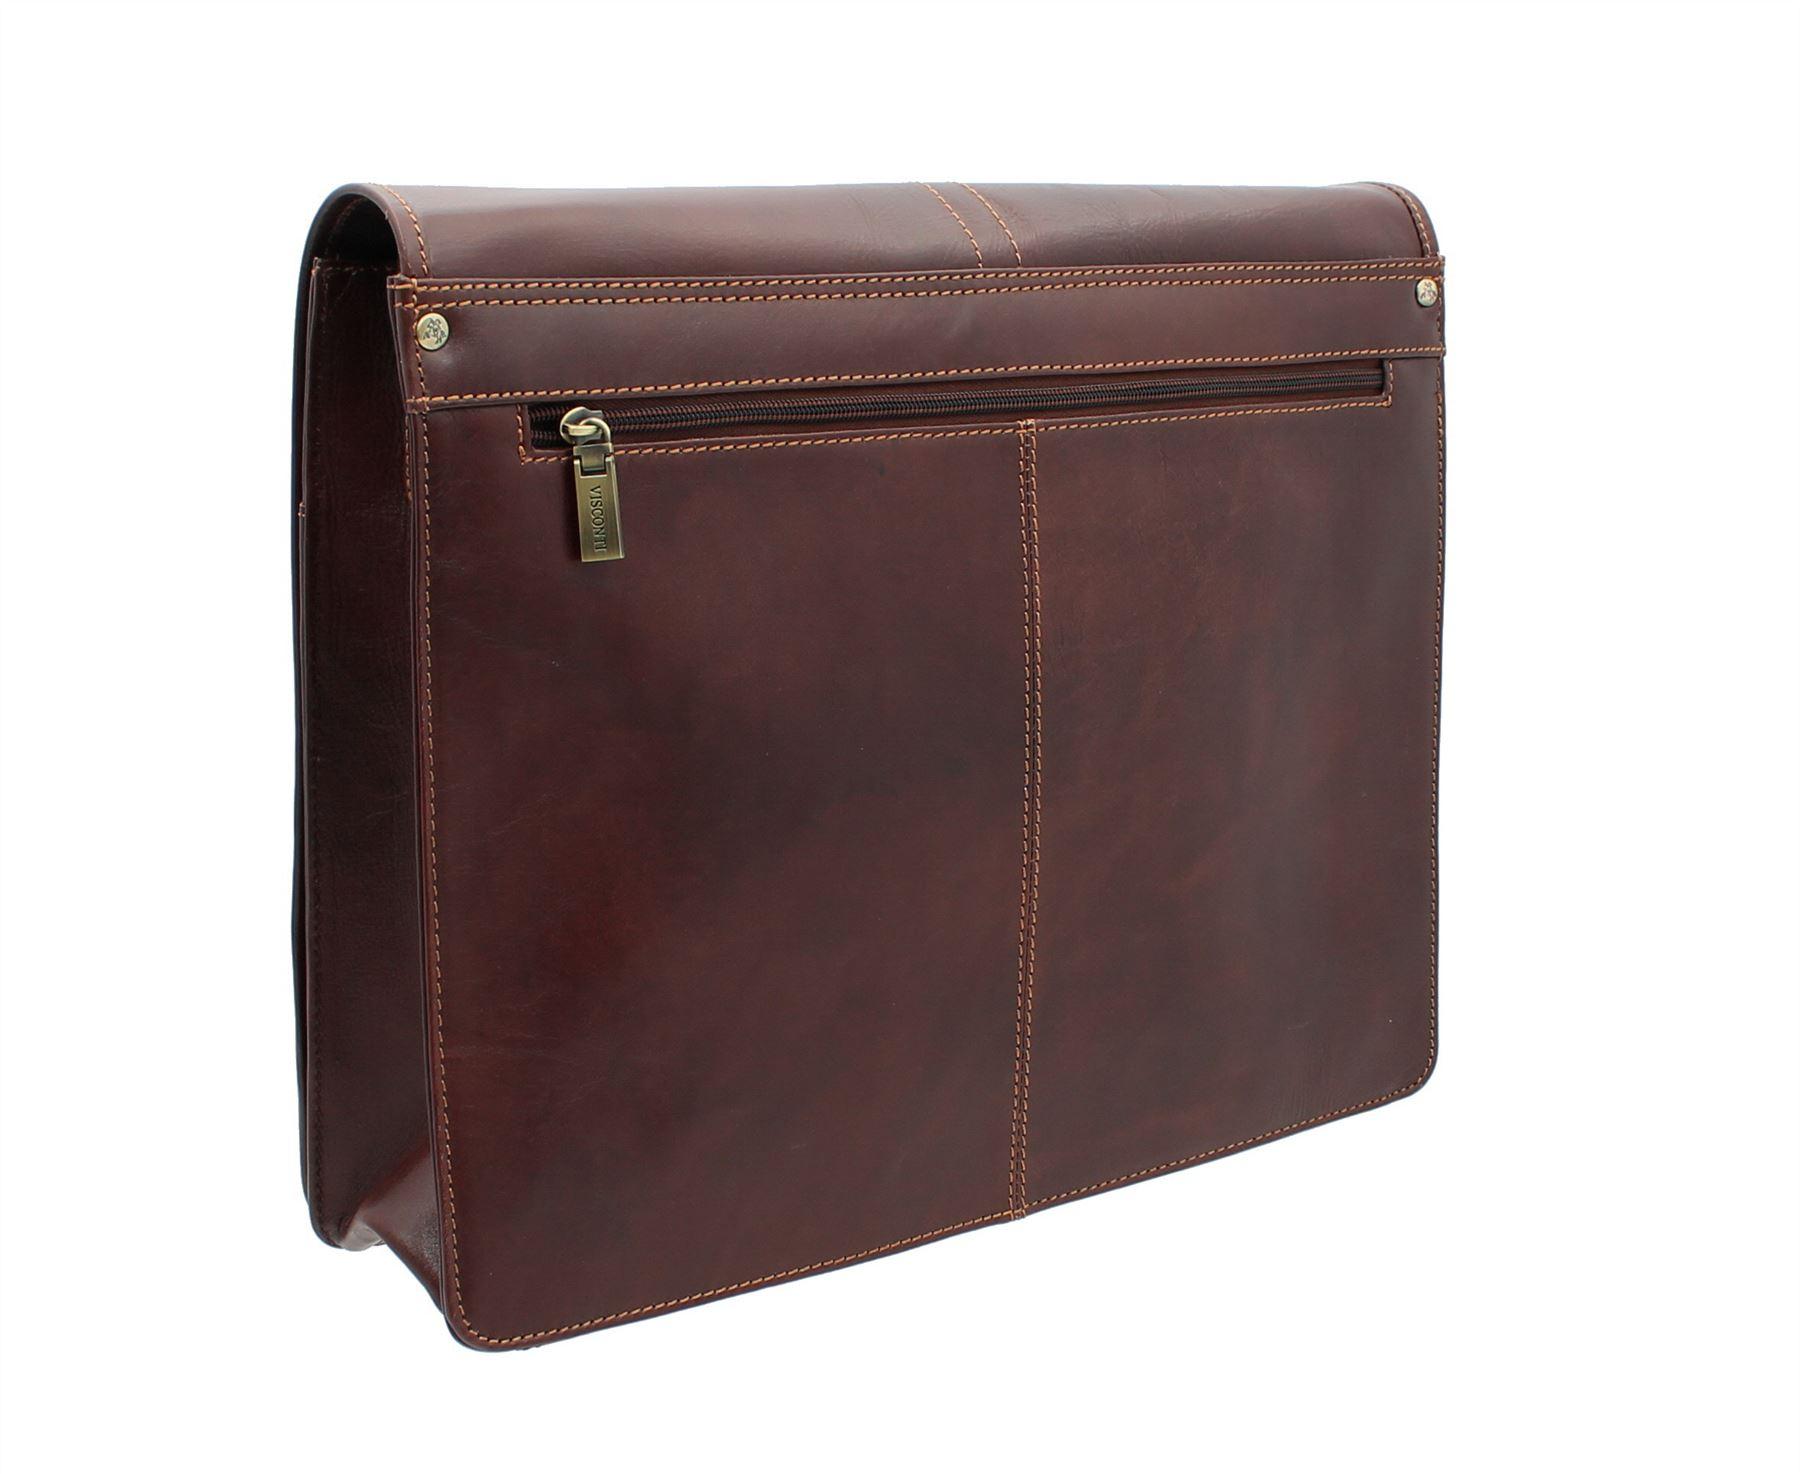 14dc93f569f Visconti-Aldo-Vintage-Tan-Leather-Briefcase-VT7 thumbnail 7